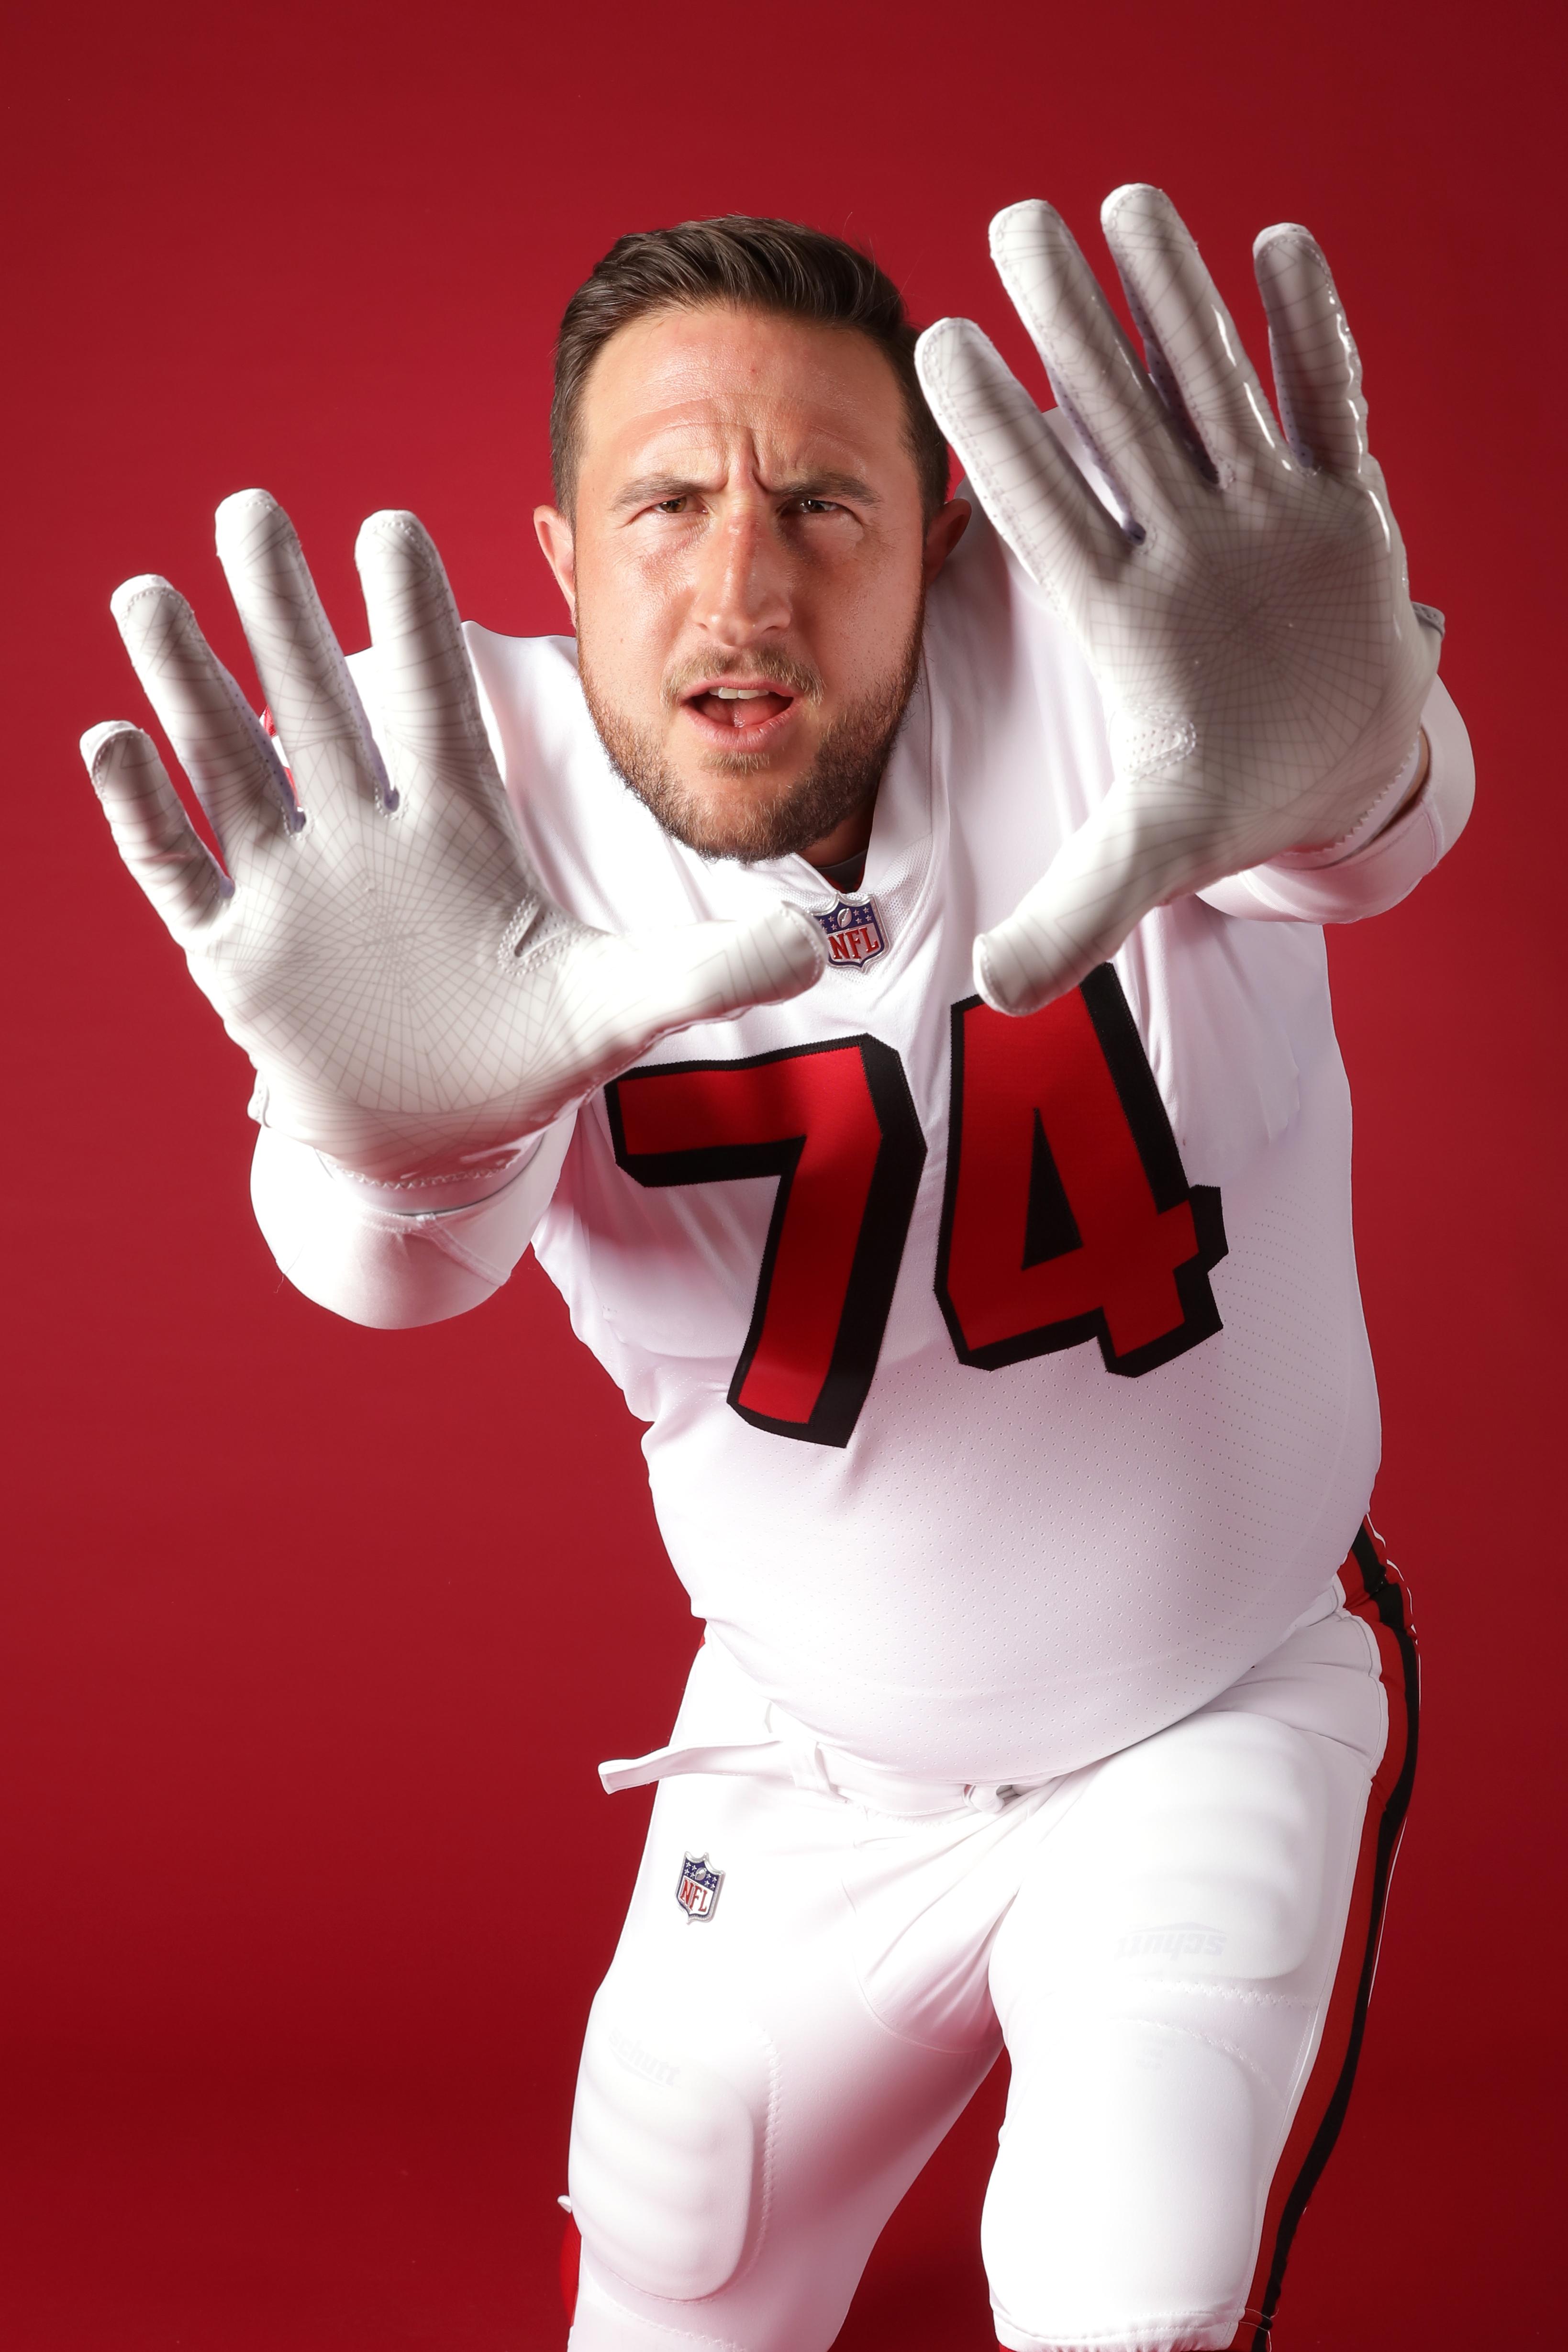 94c0fd4e6e3 49ers to wear throwback uniform for Sunday Night Football vs. Rams ...